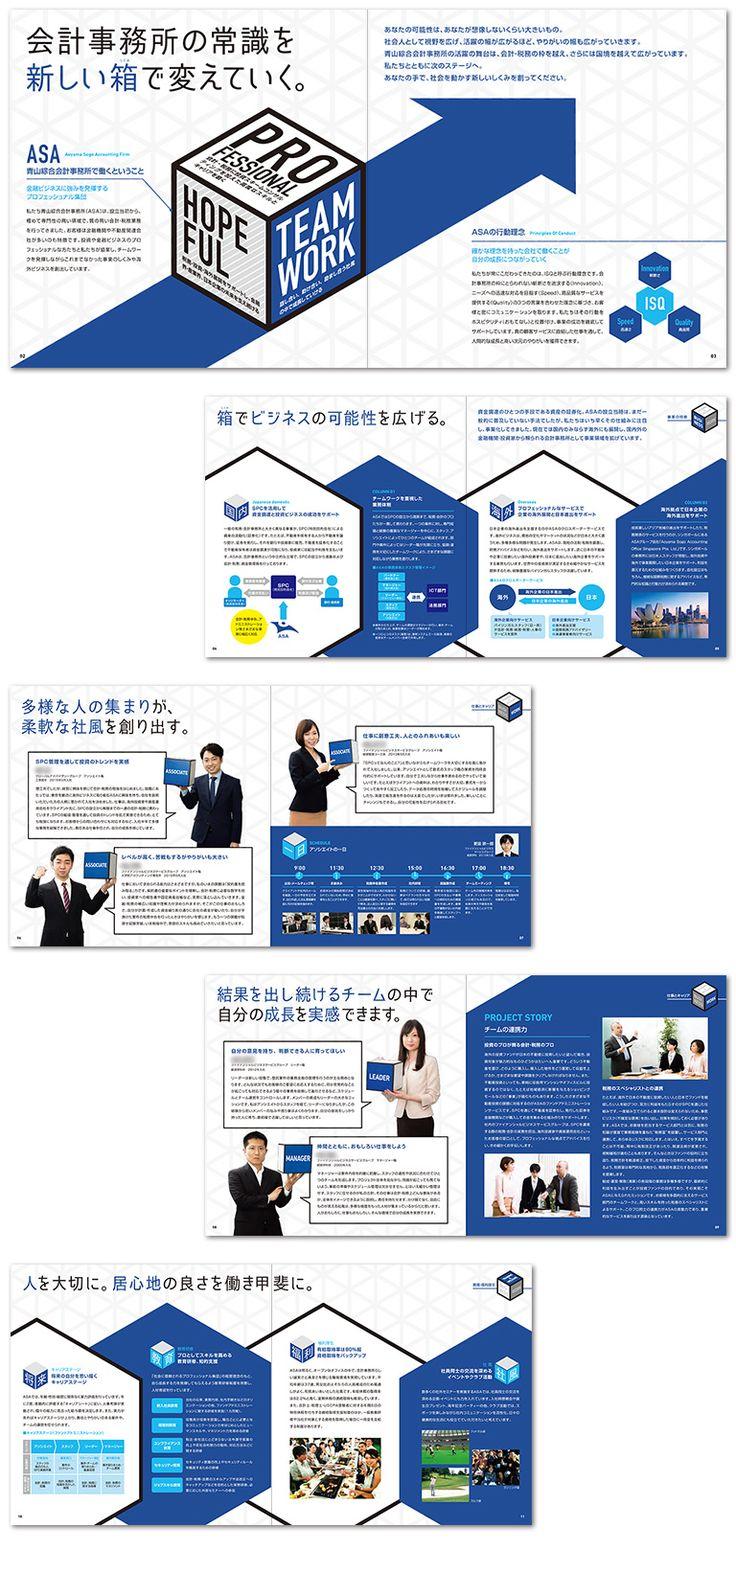 SPC会計事務所の採用パンフレット作成実績